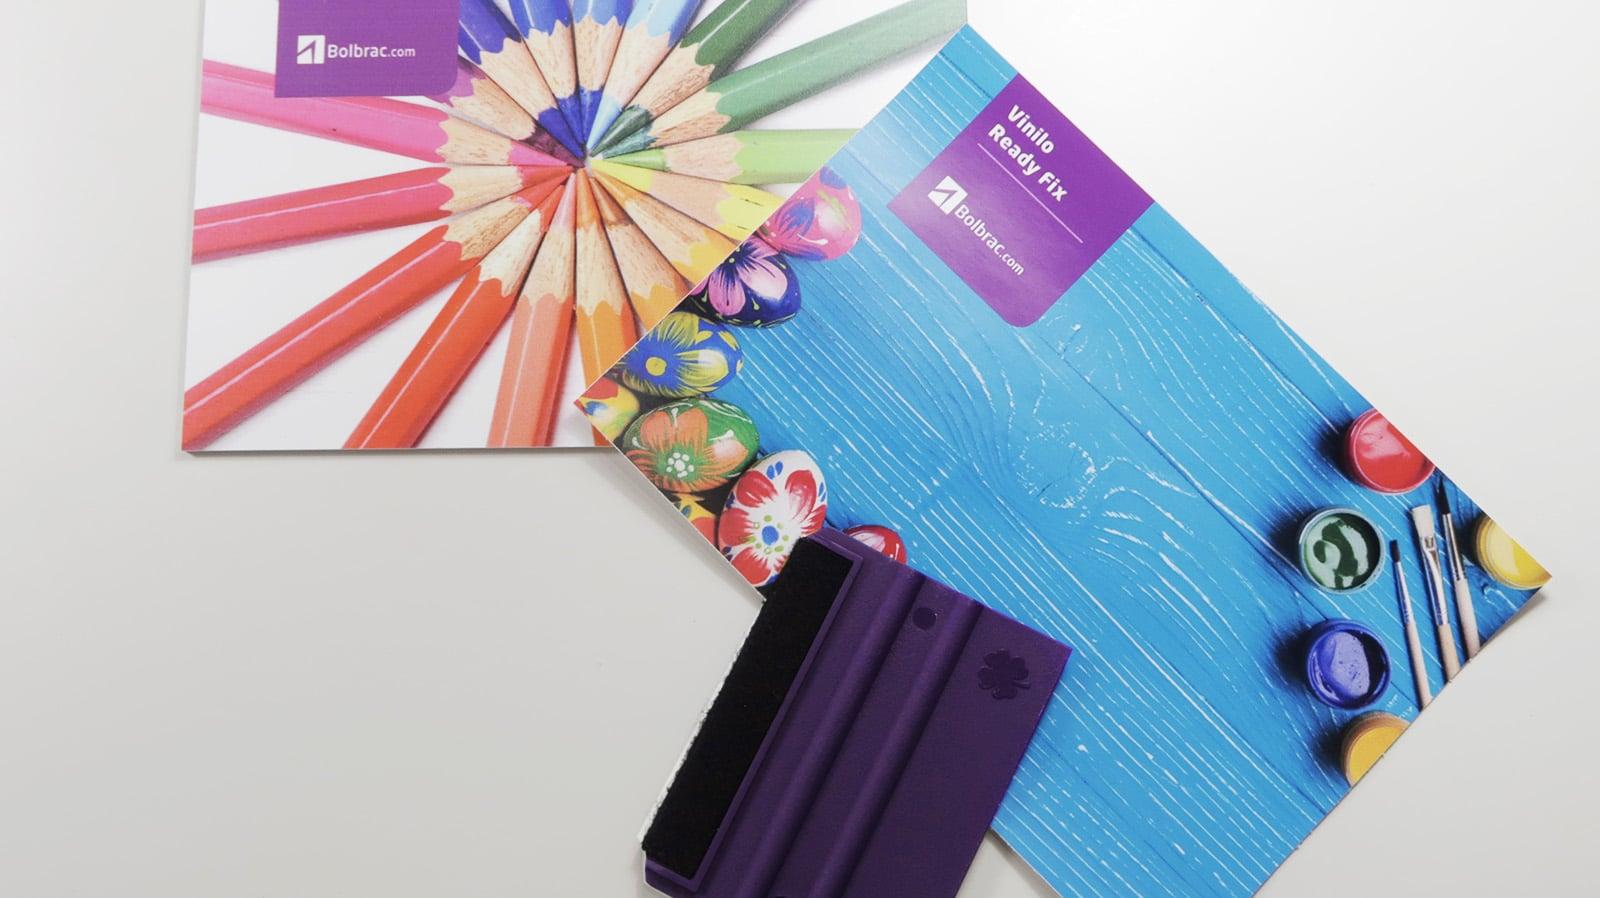 Instalación vinilo antiburbujas Bolbrac Digital Printing